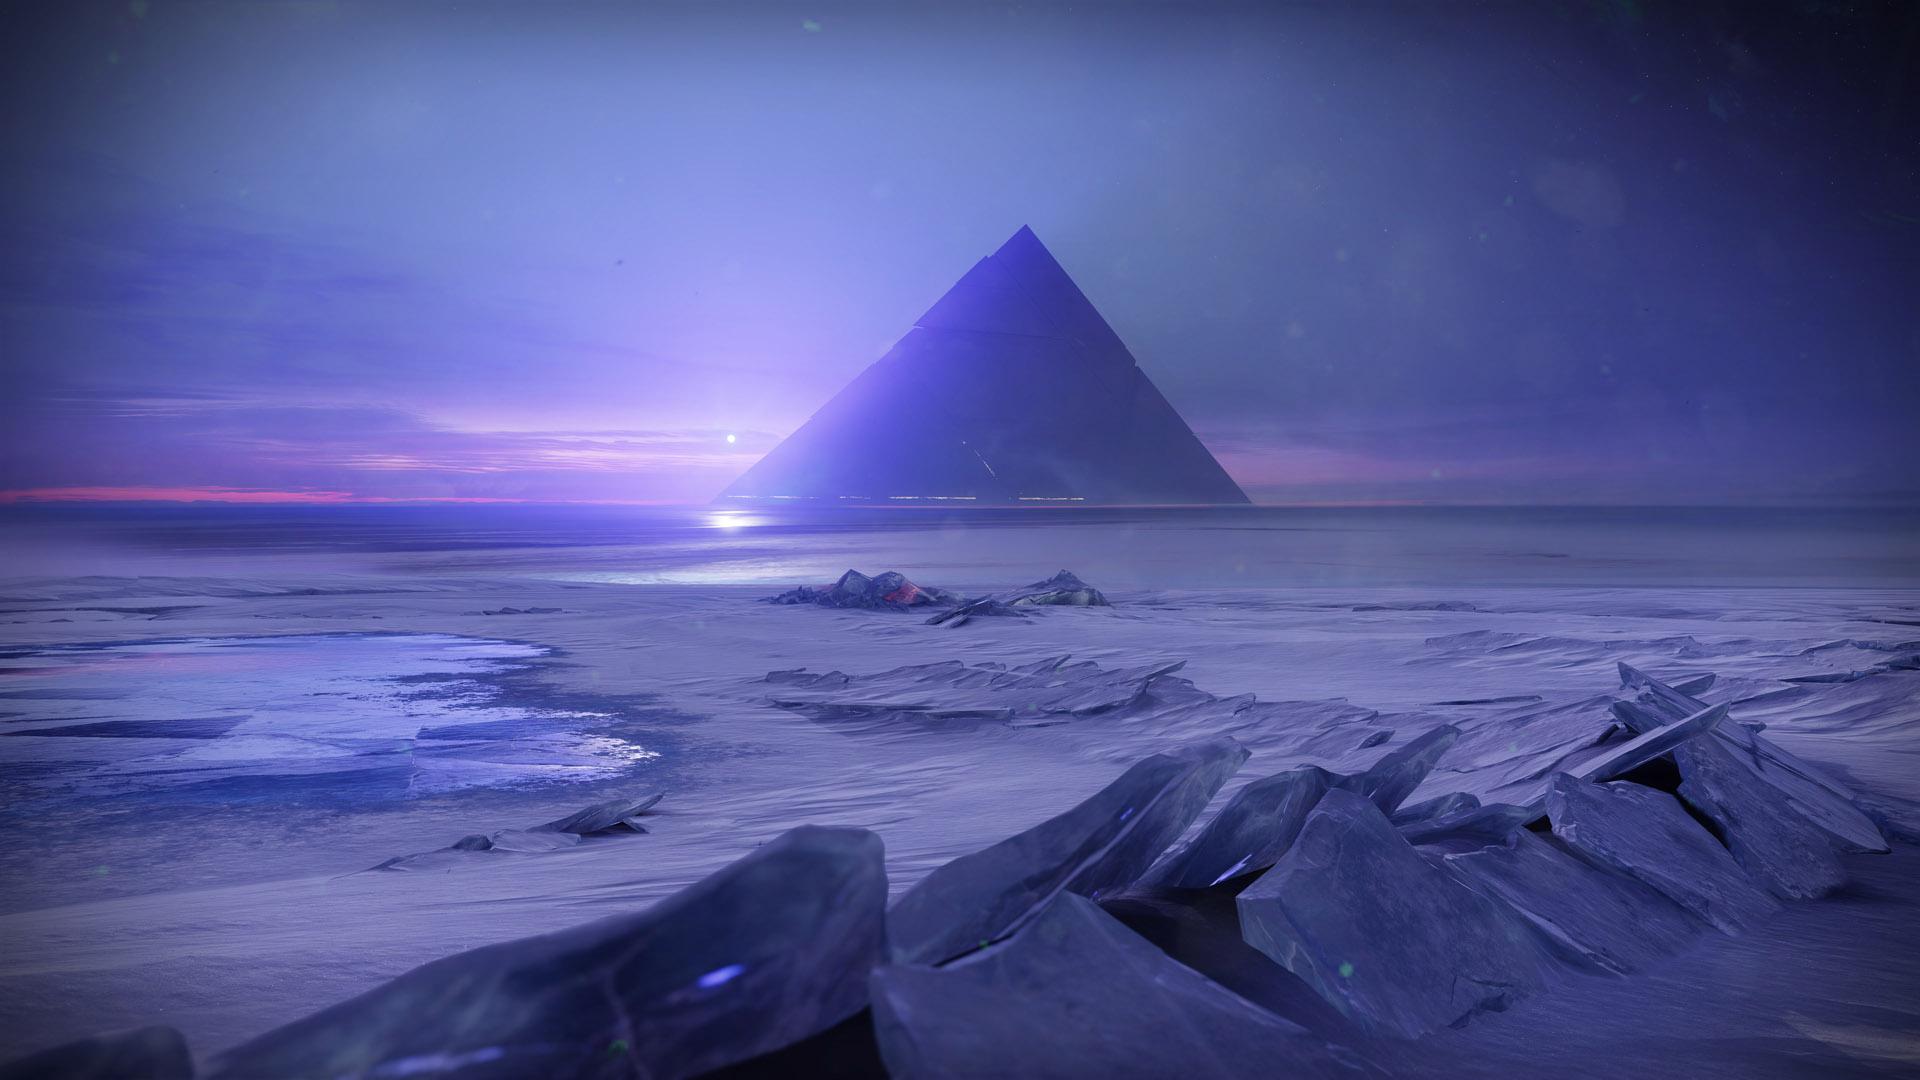 Destiny 2 Season 12 Beyond Light